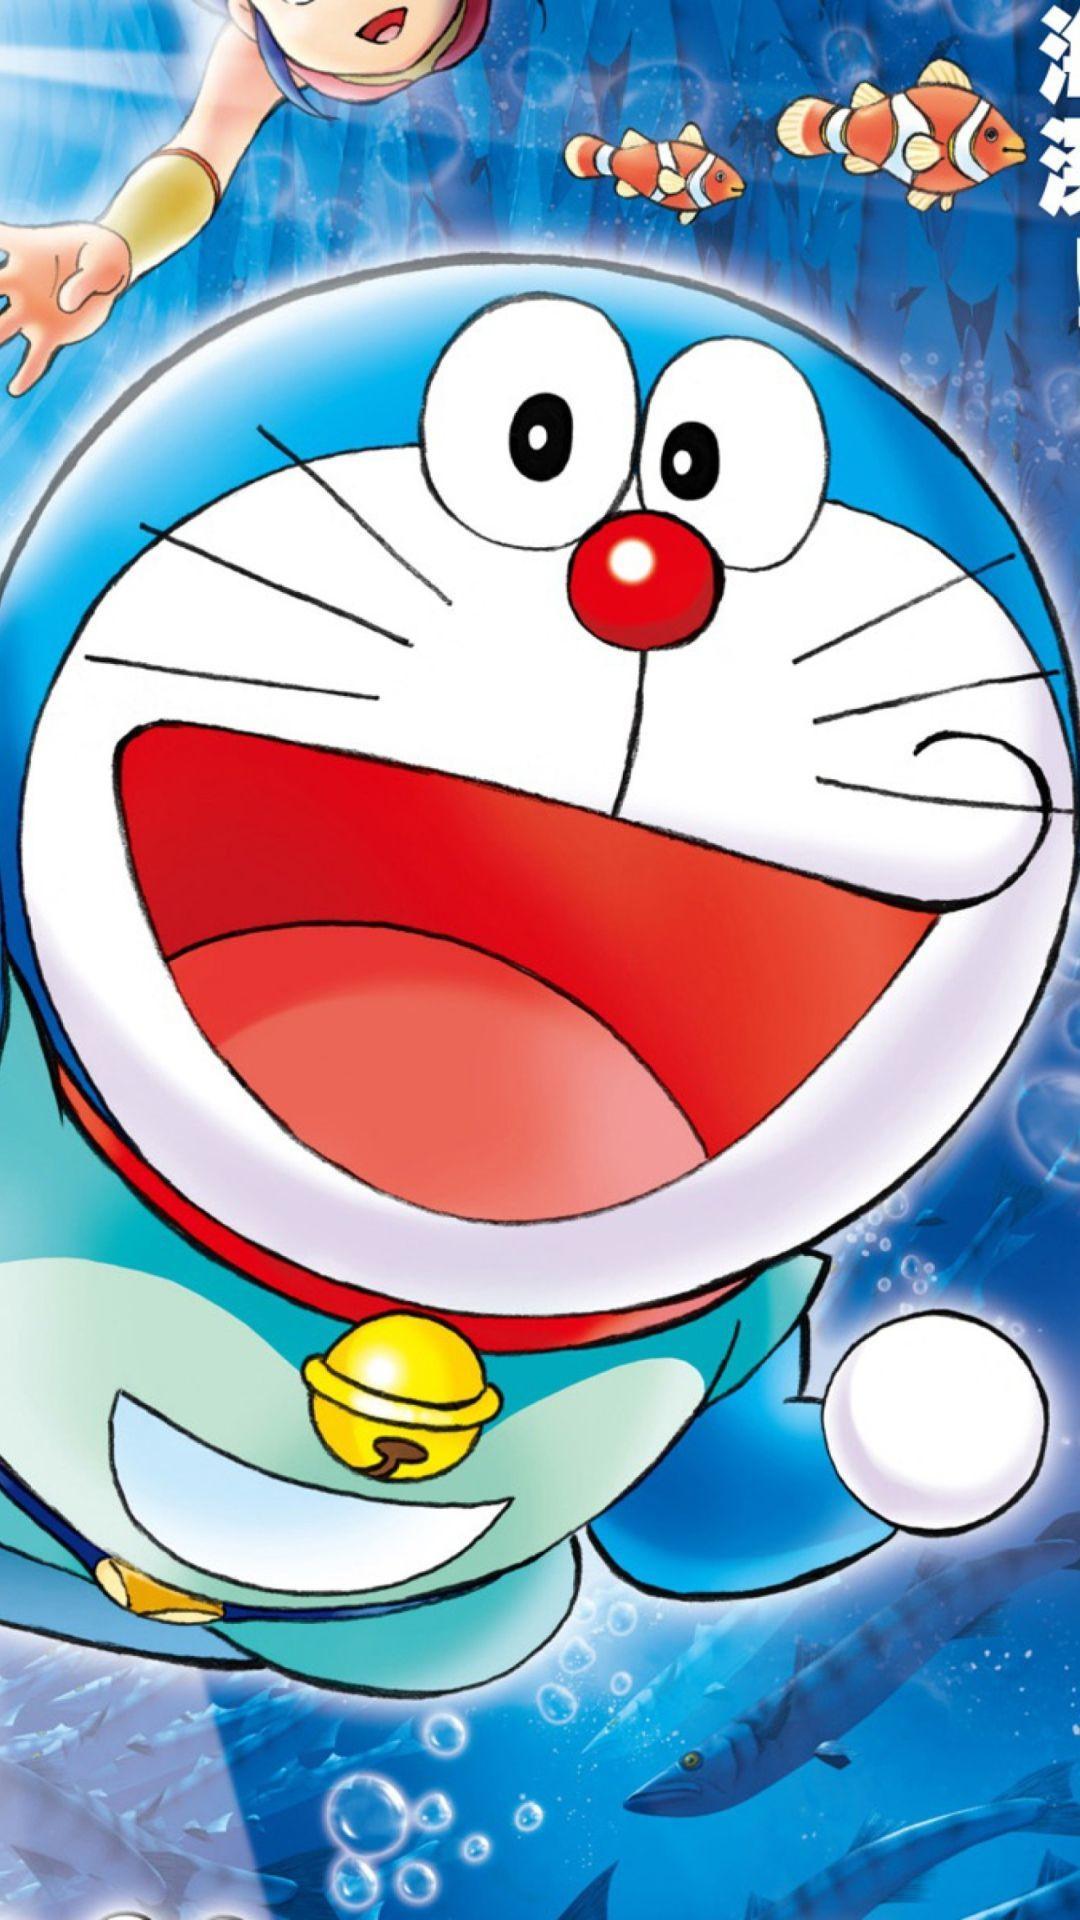 Wallpapers Doraemon Love - Wallpaper Cave